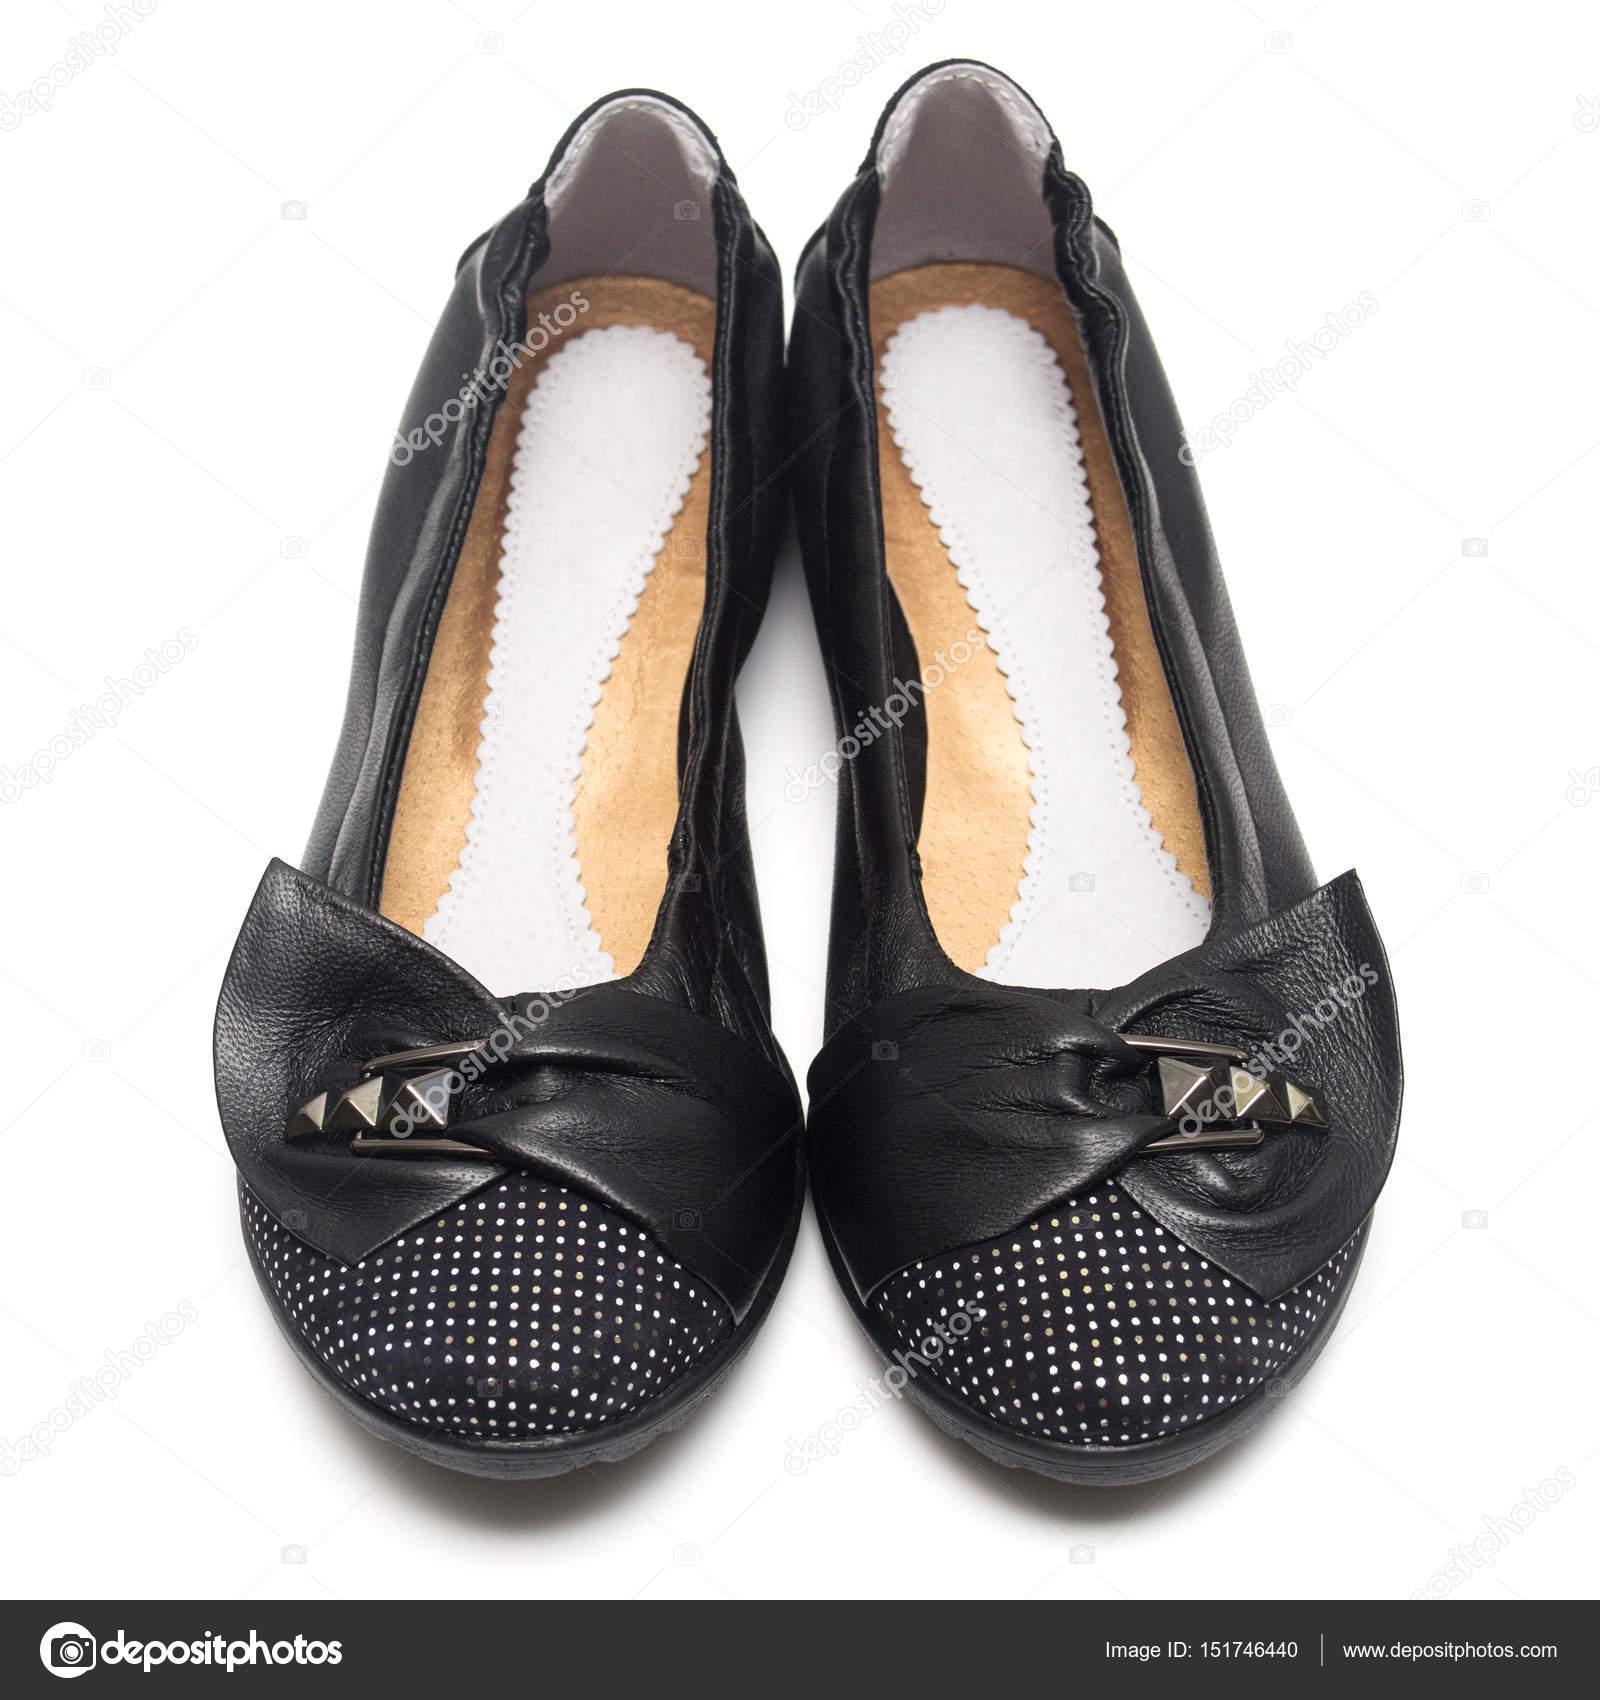 3fbfa965f61 Γυναίκες παπούτσια μπαλέτου που απομονώνονται σε λευκό φόντο. Επίπεδη lay,  κορυφαία προβολή — Εικόνα από ...